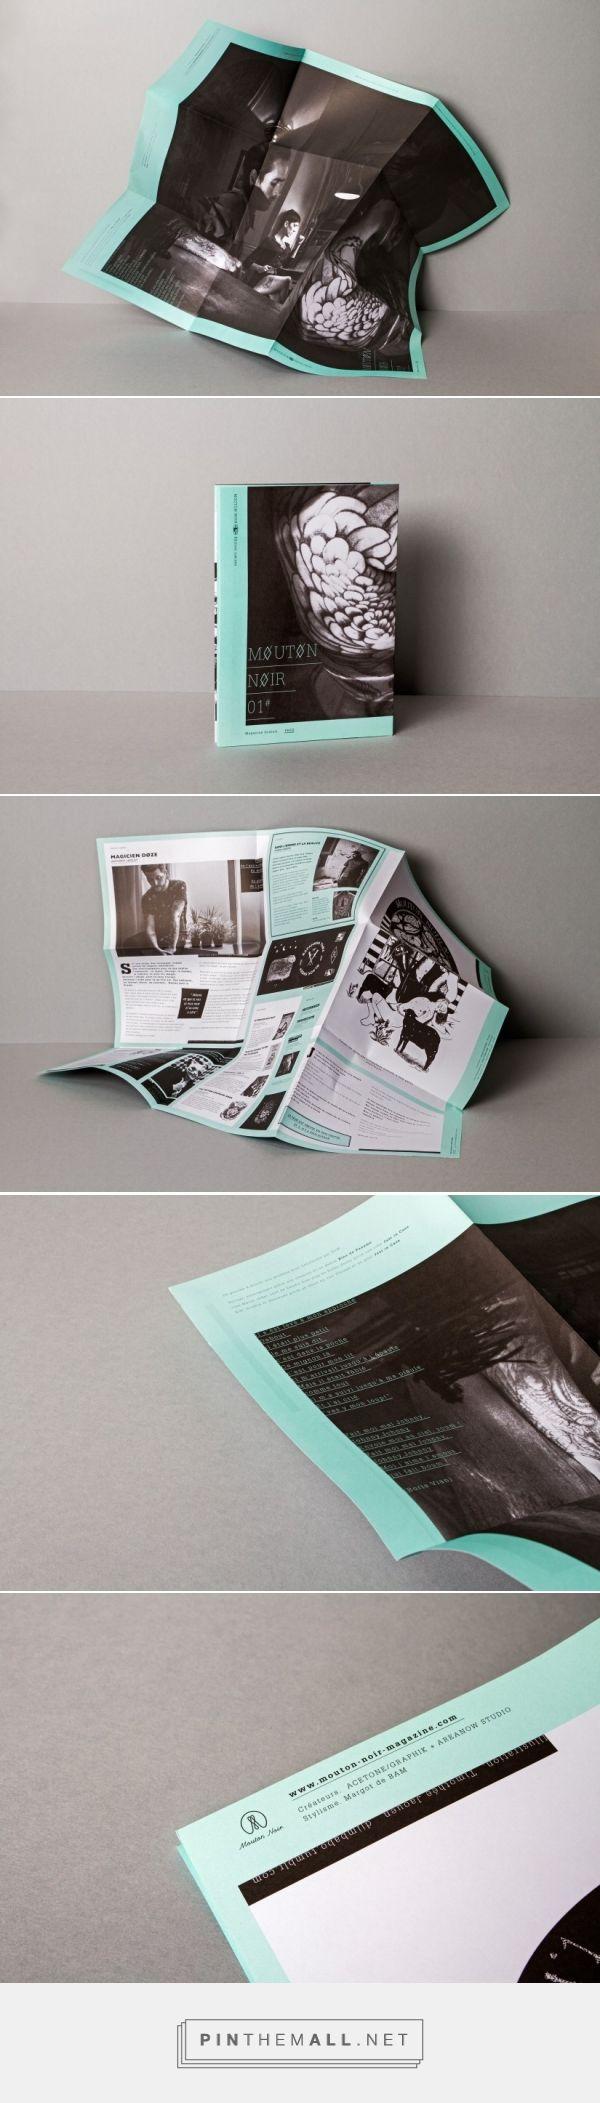 Projets - ACETONE GRAPHIK studio design indépendant - created via https://pinthemall.net